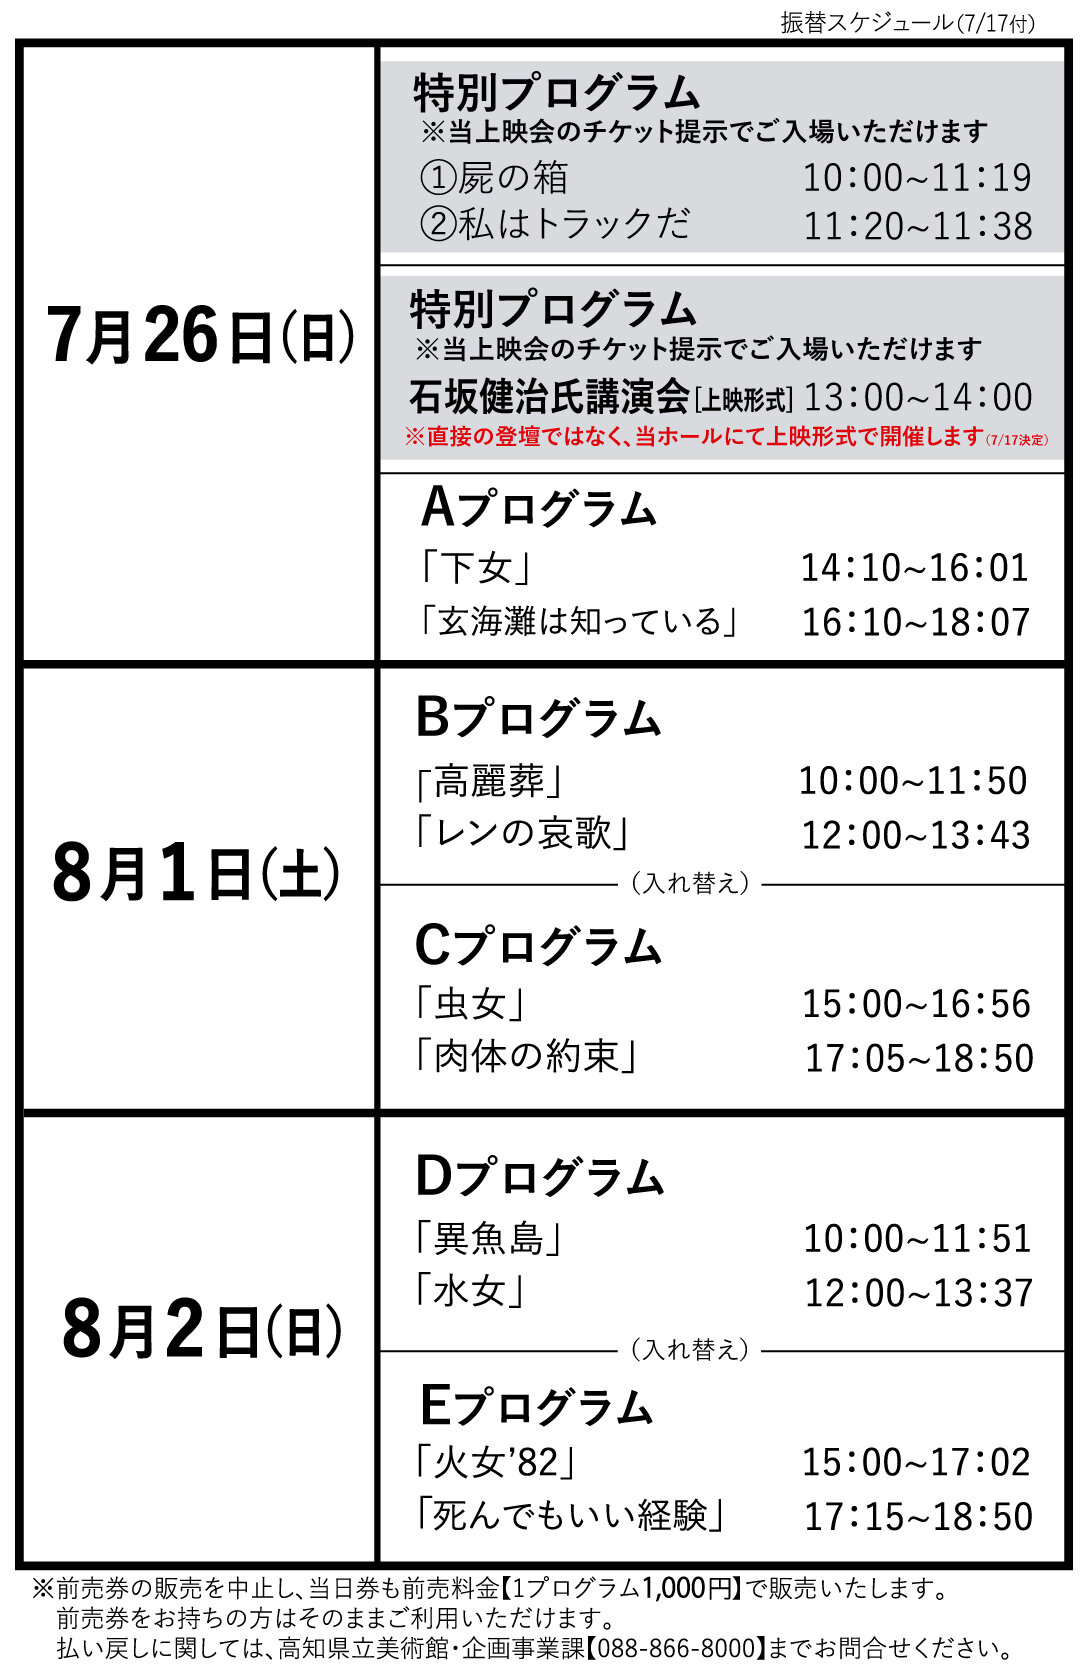 https://moak.jp/event/tmp/75df2969db529e225c4919cefe3e91f7415b8c62.jpg